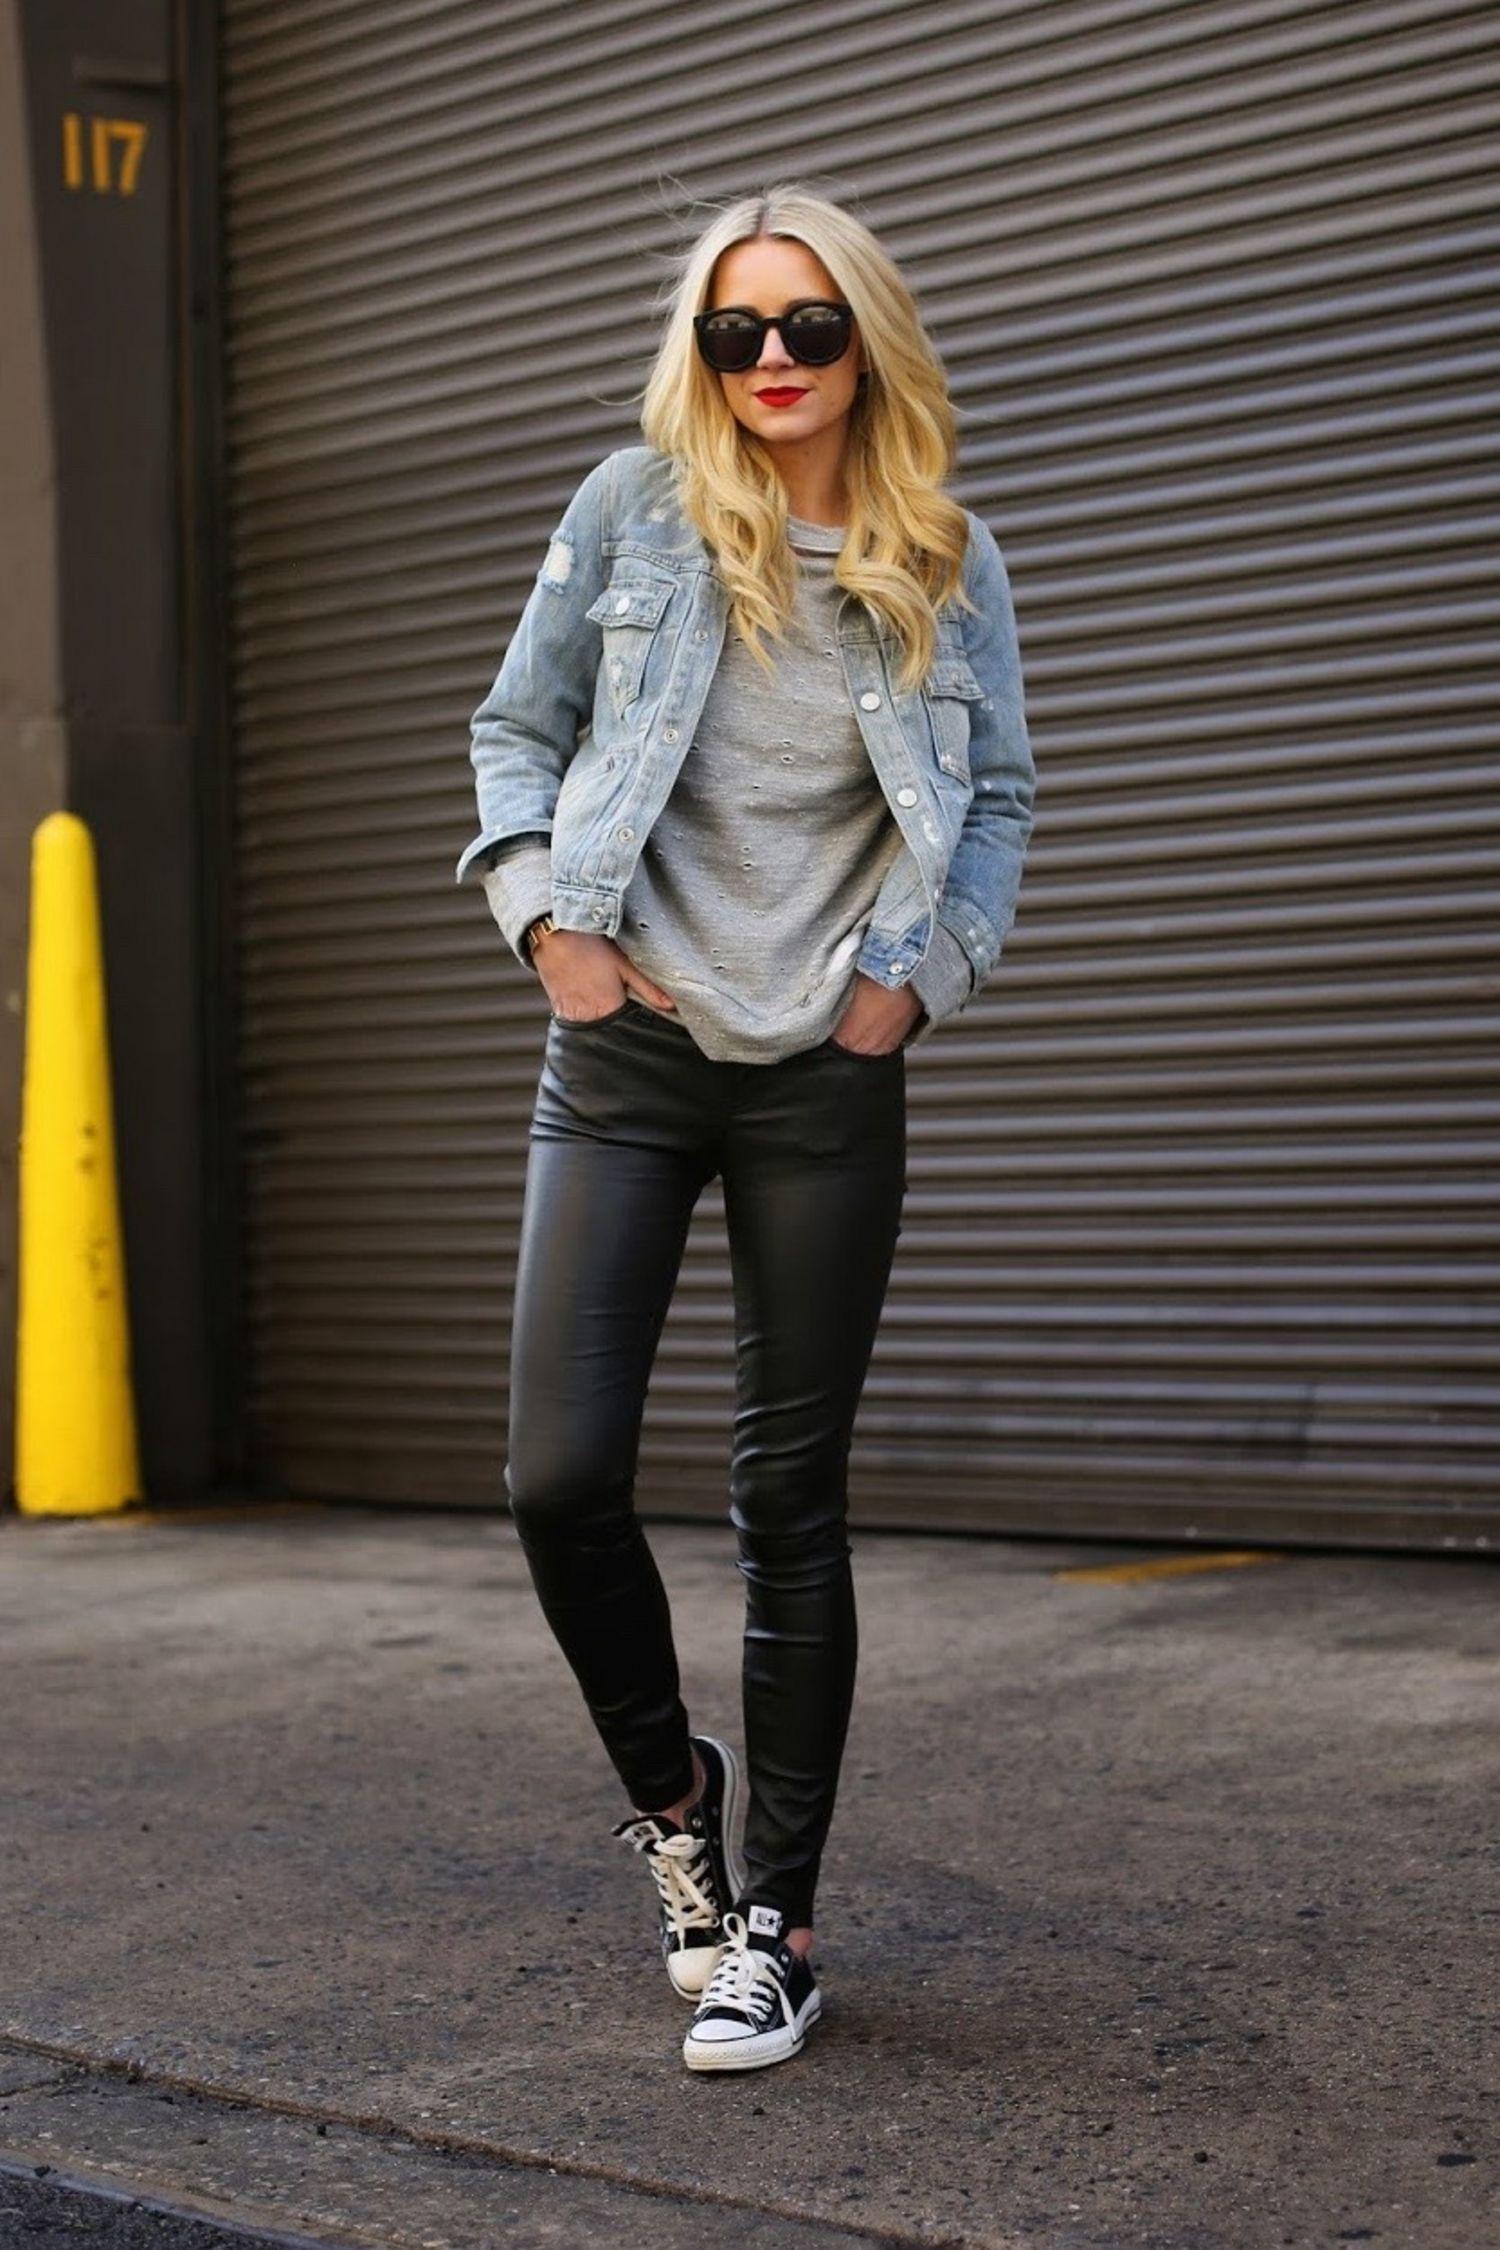 Women Leather Pants with Denim Jacket